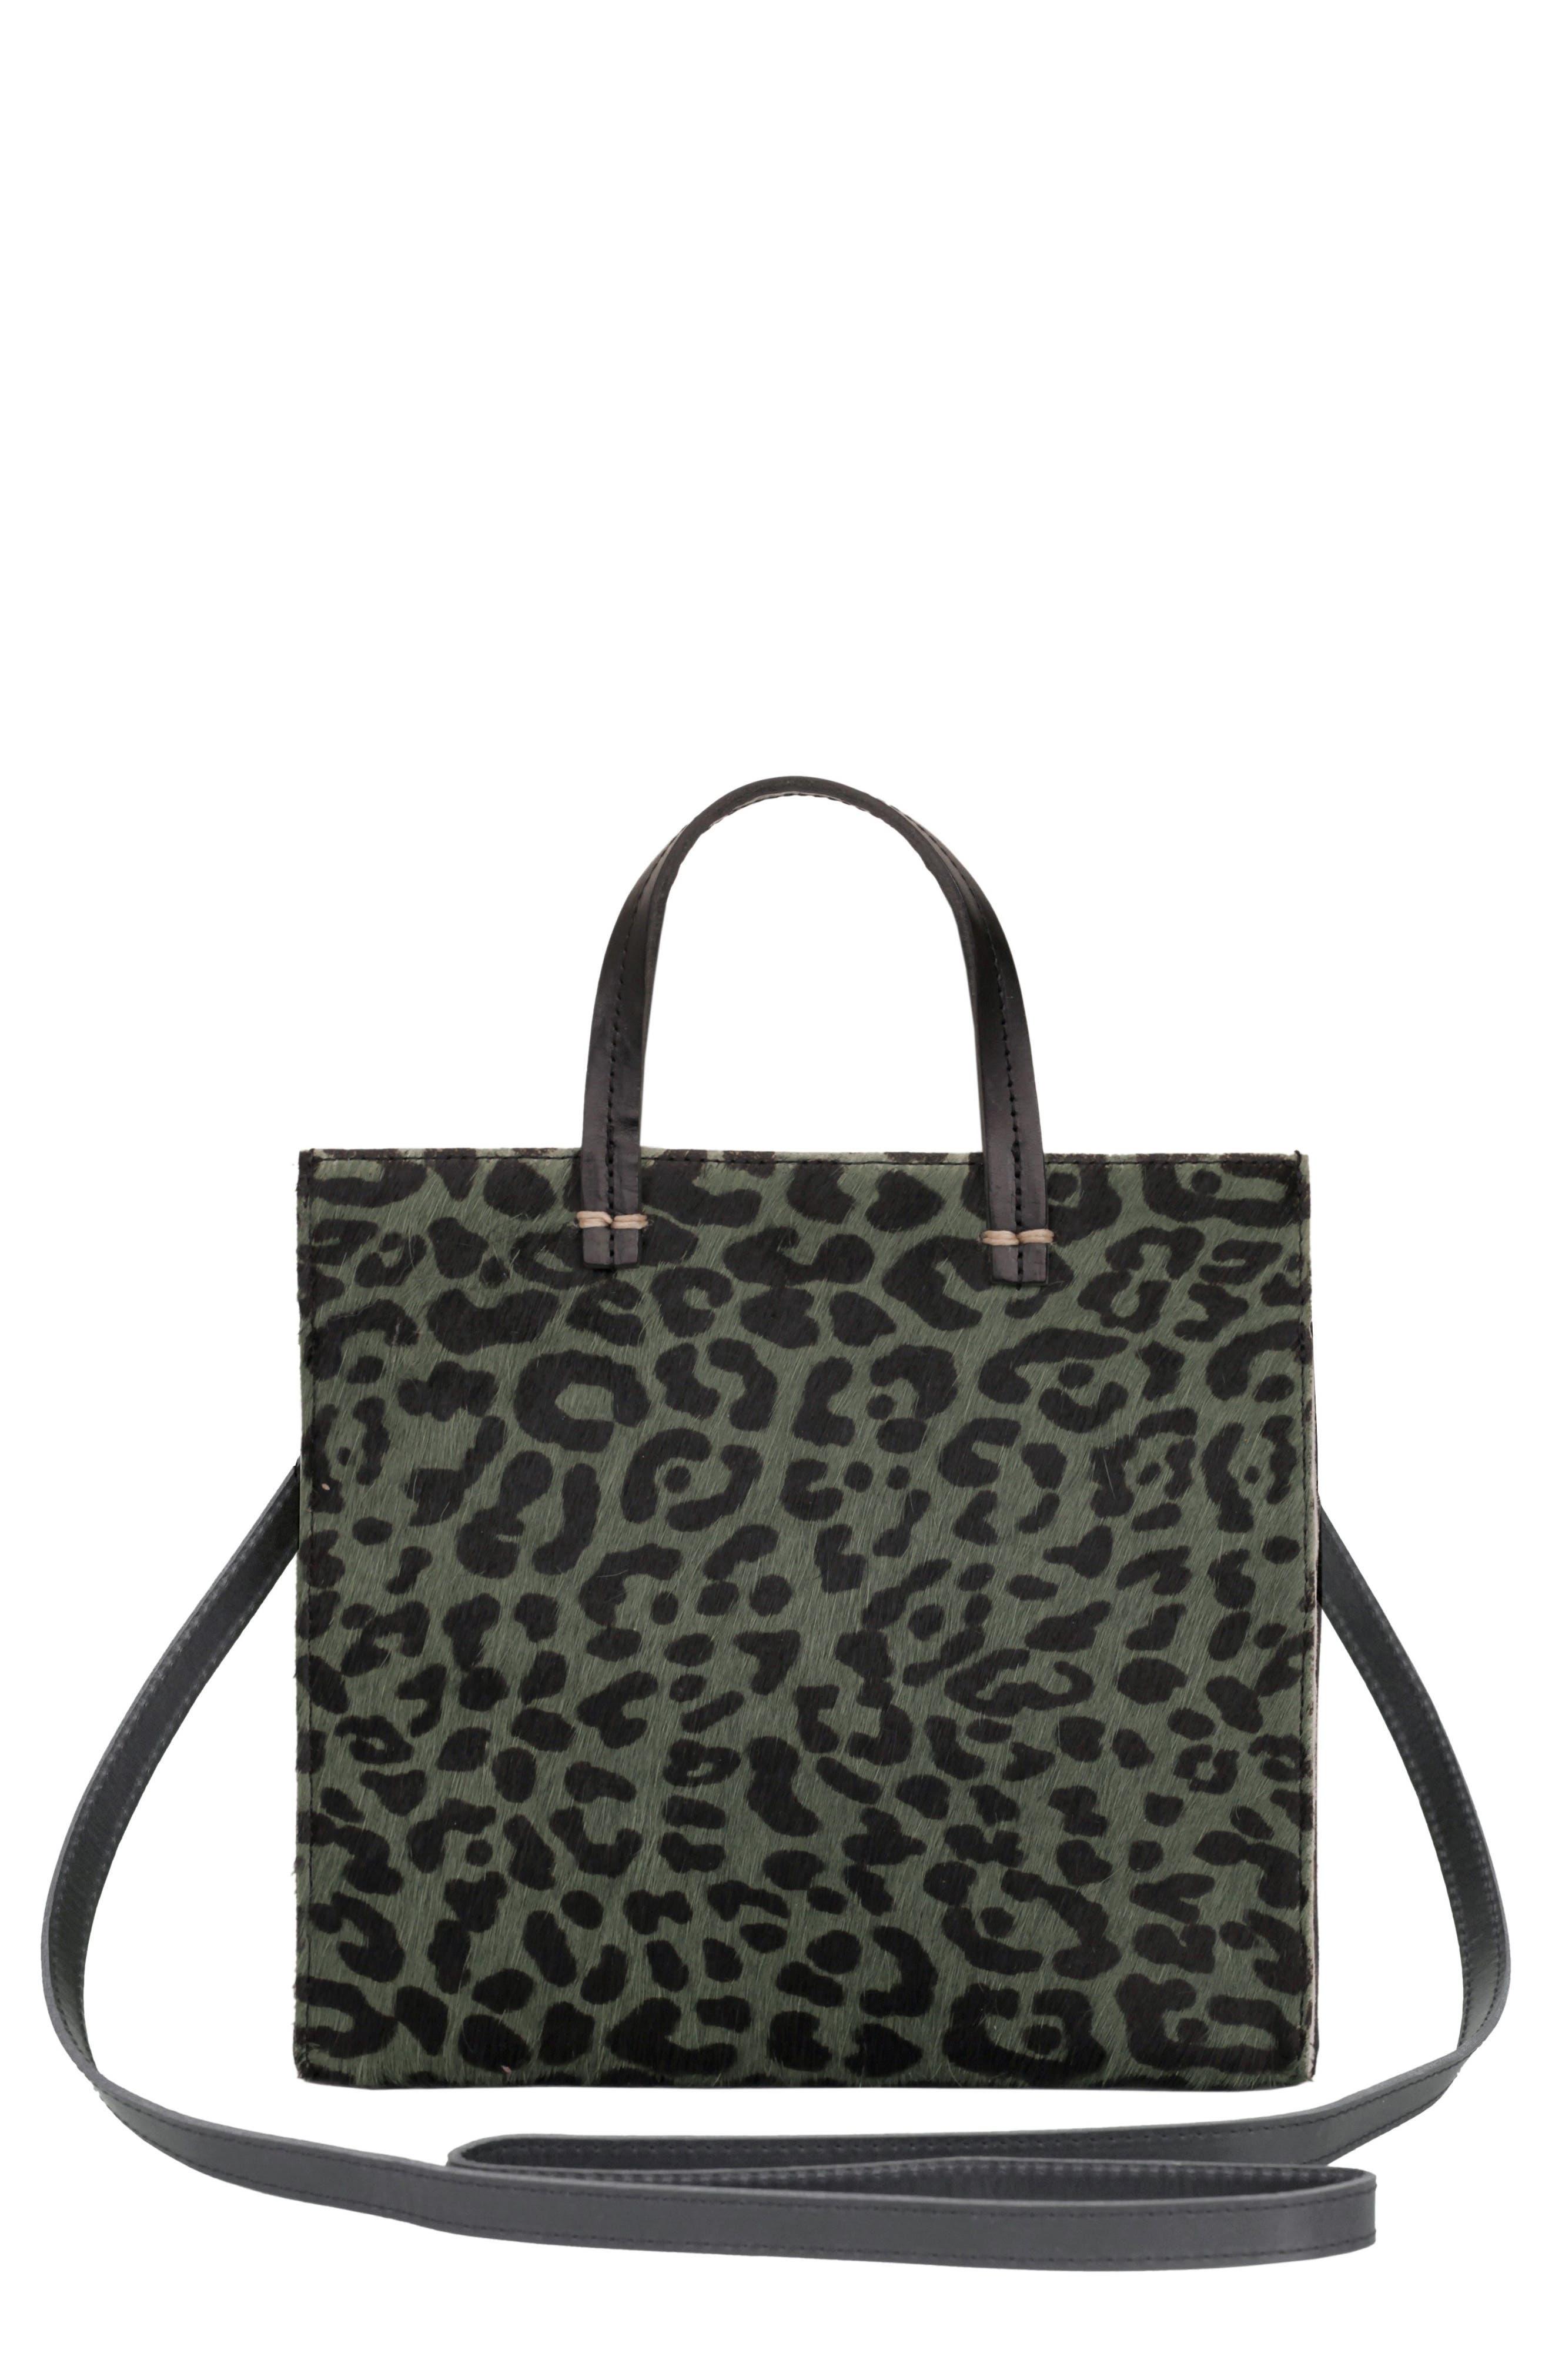 Alternate Image 1 Selected - Clare V. Small Petit Simple Leopard Print Genuine Calf Hair Tote